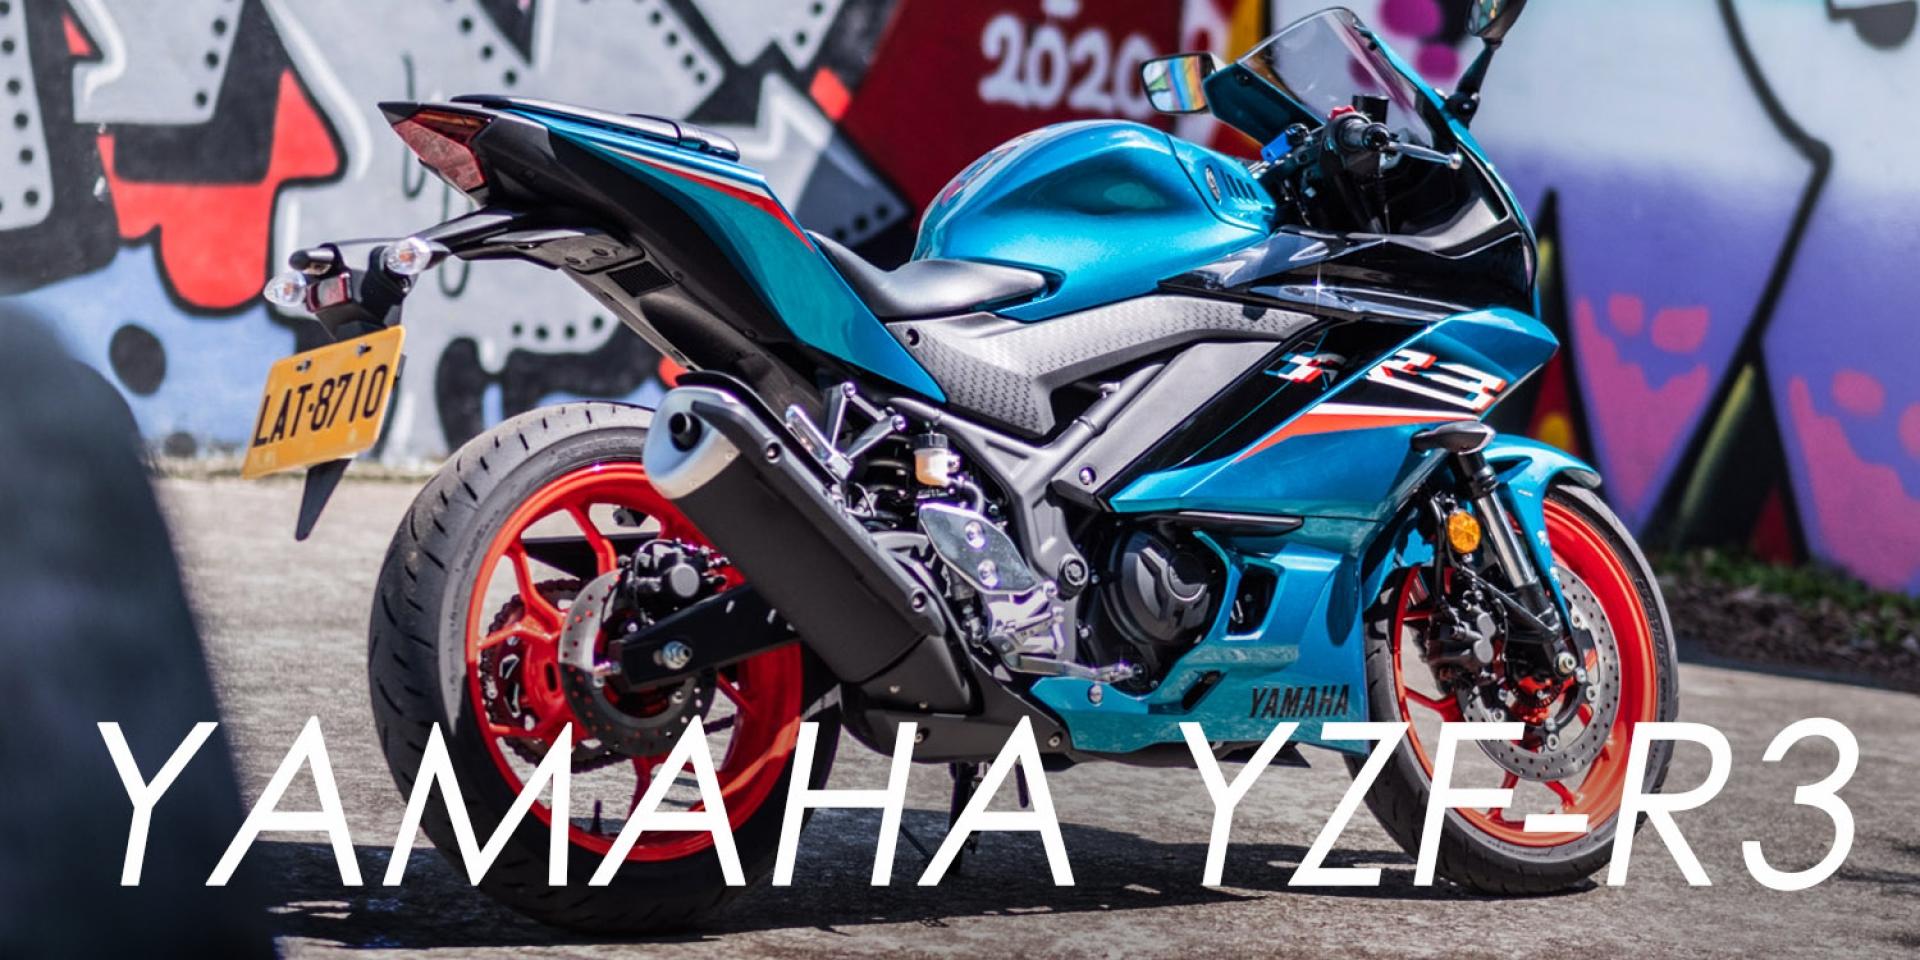 身披科幻新色的R DNA輕跑。2021 YAMAHA YZF-R3